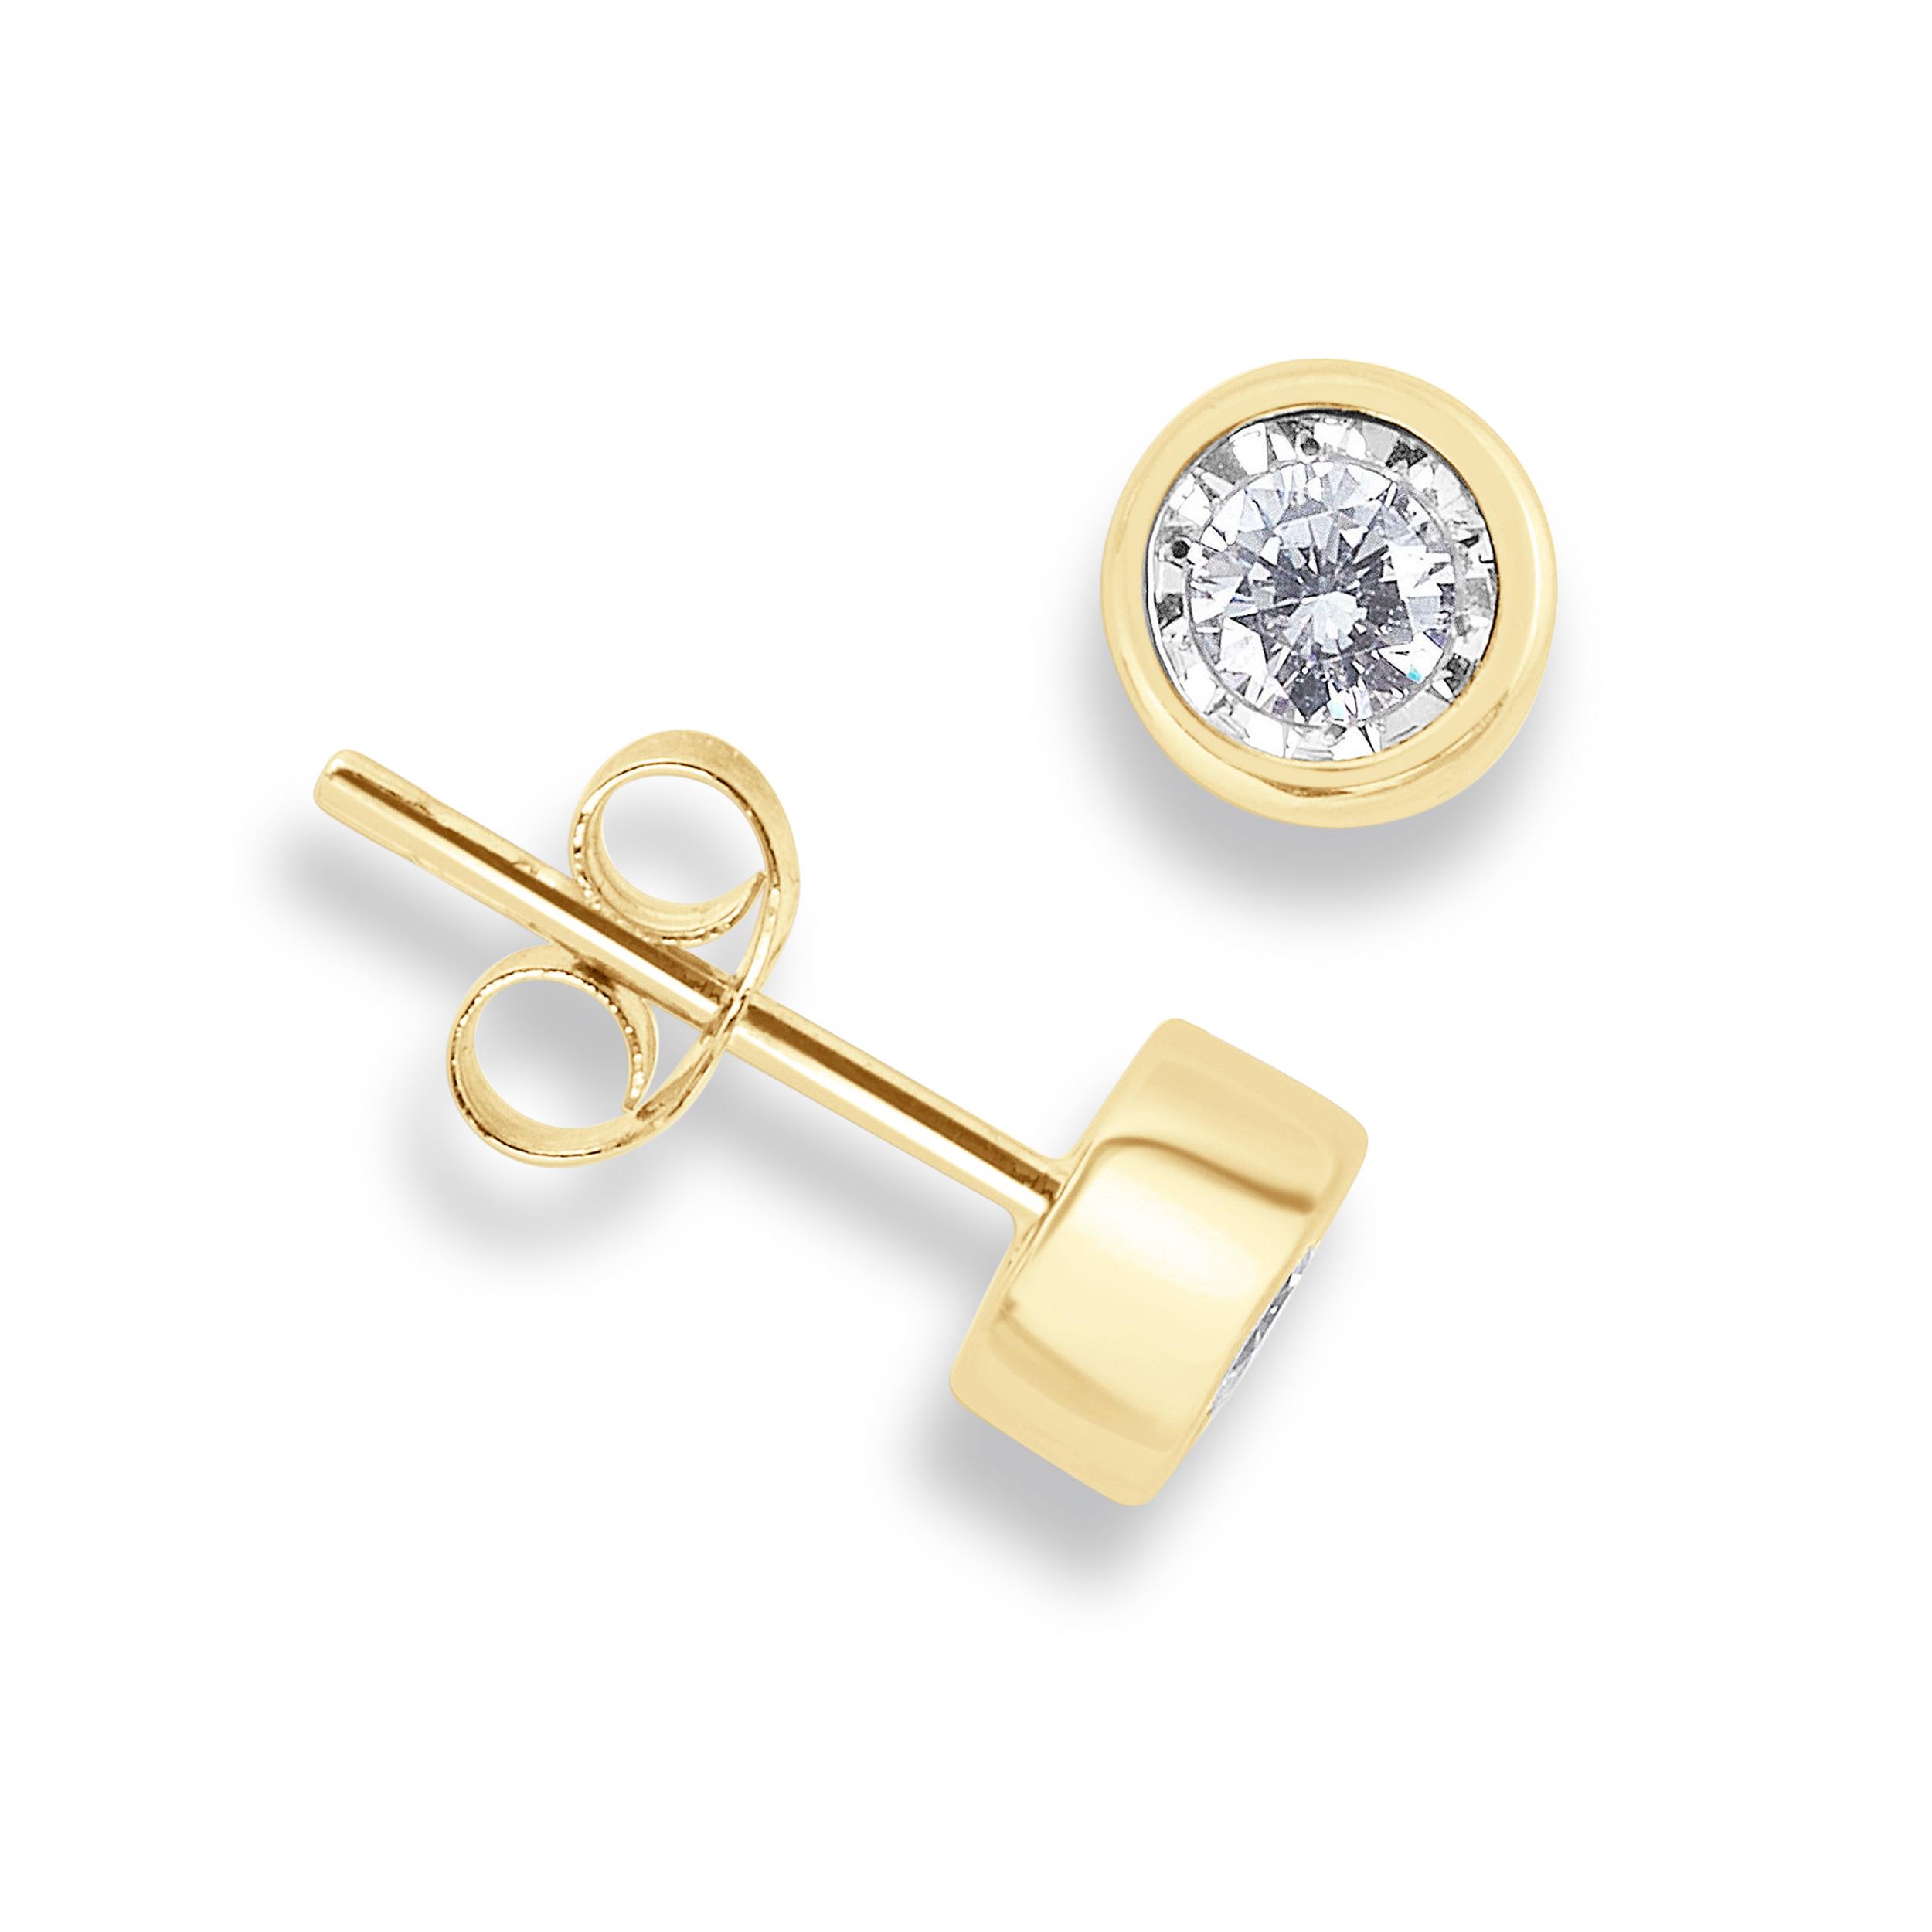 5805ab359cf60 Buy Bezel Setting Illusion Set Round Diamond Stud Earrings - Hand ...